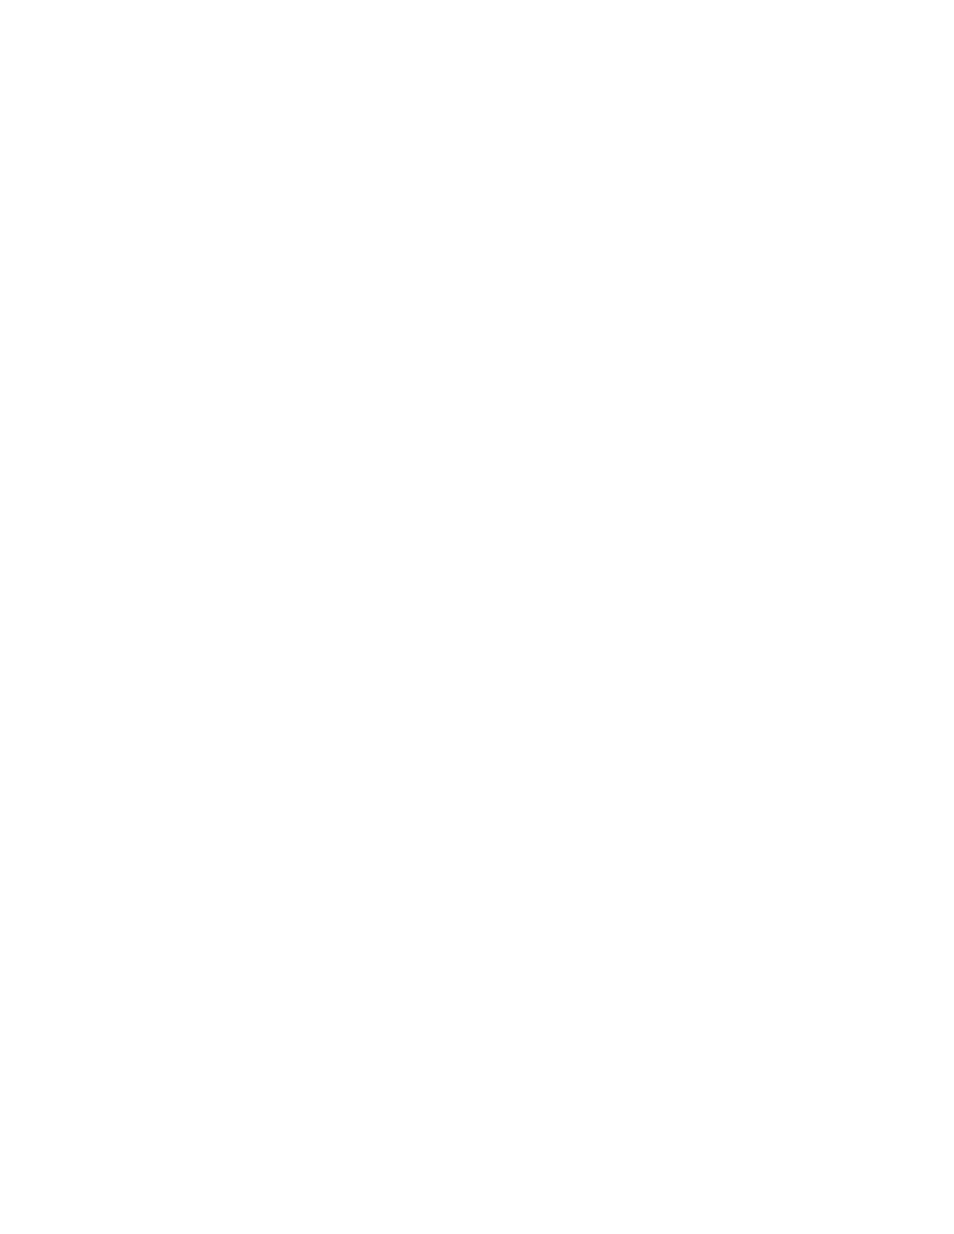 Dometic RM660 User Manual | Page 11 / 12 | Original mode